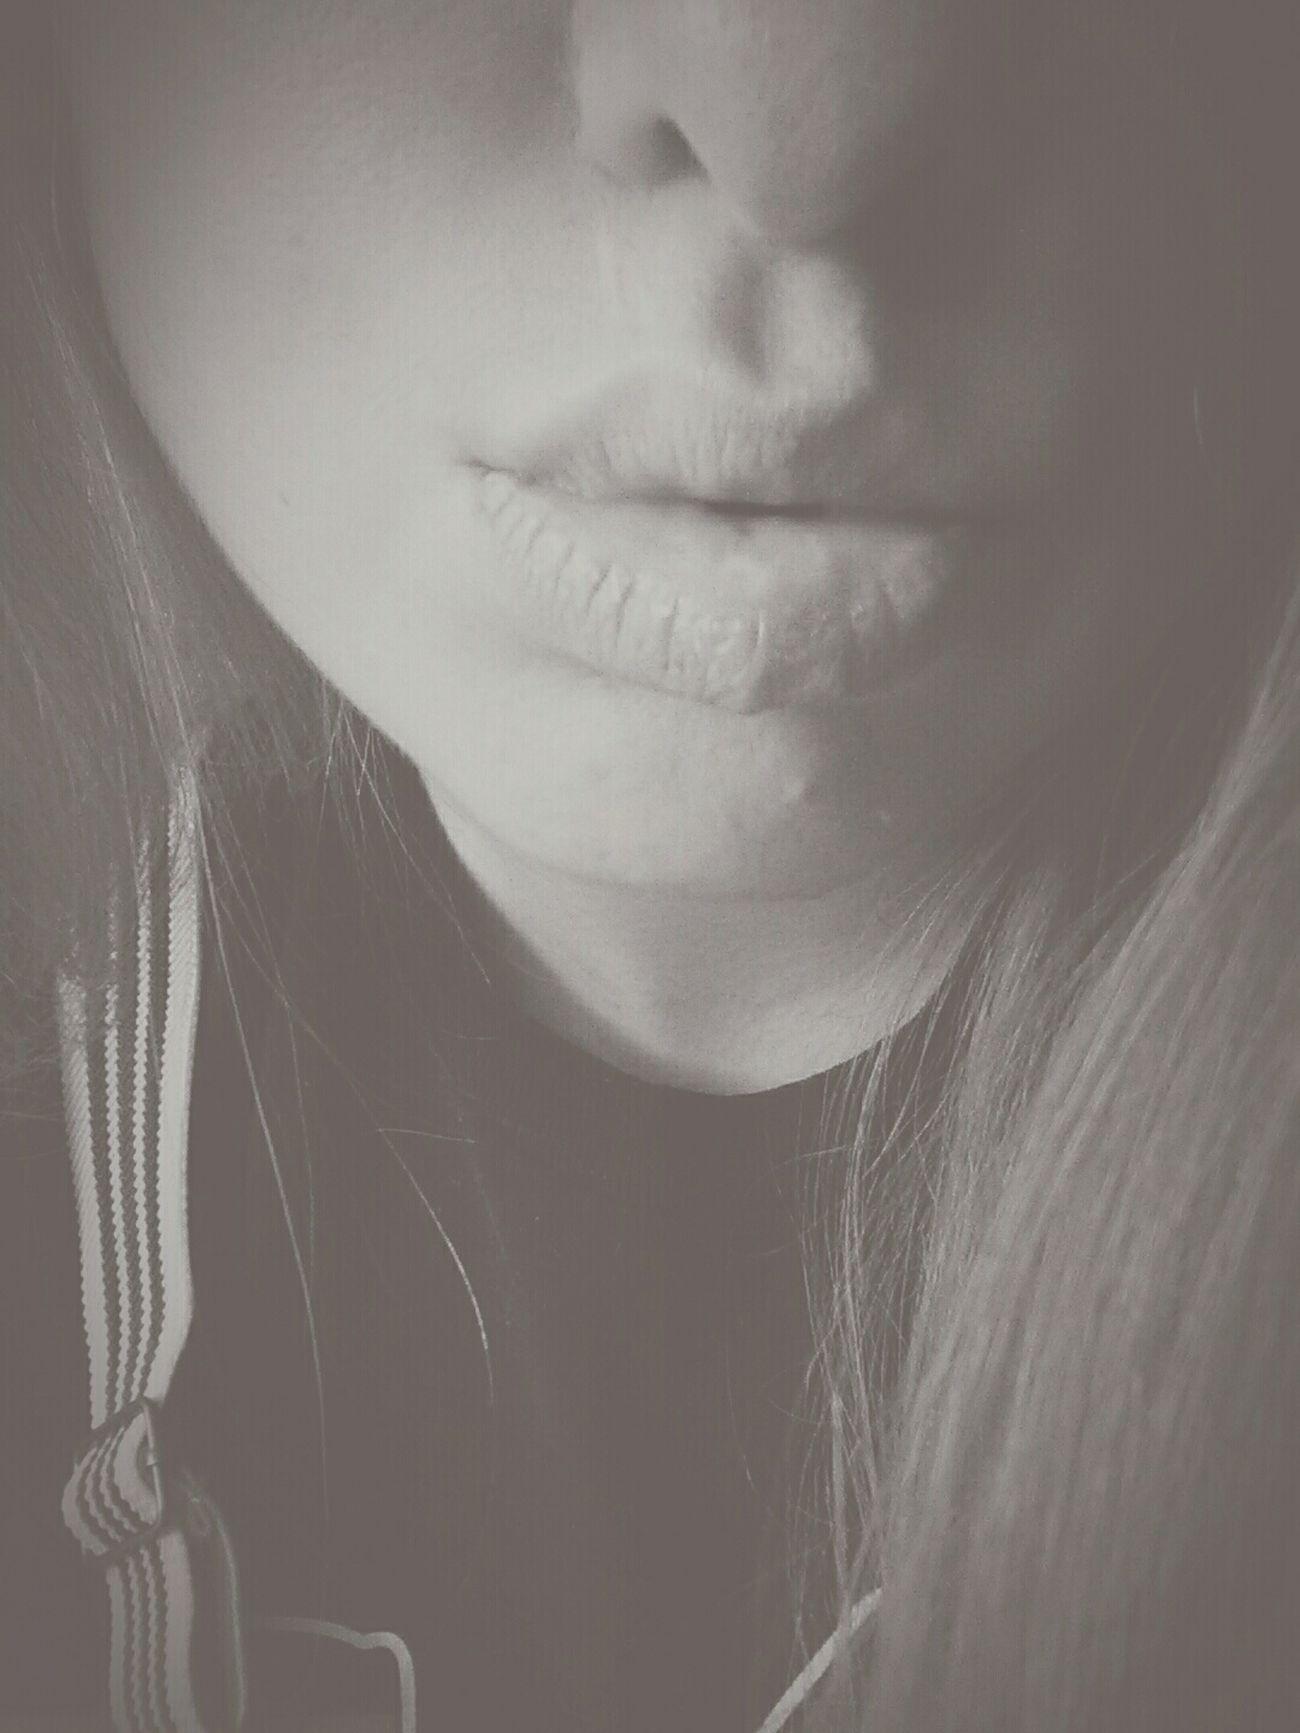 Blackandwhite Teamfulllipss Beautifullips Lips Check This Out JustMe Kiss Kiss Beautiful